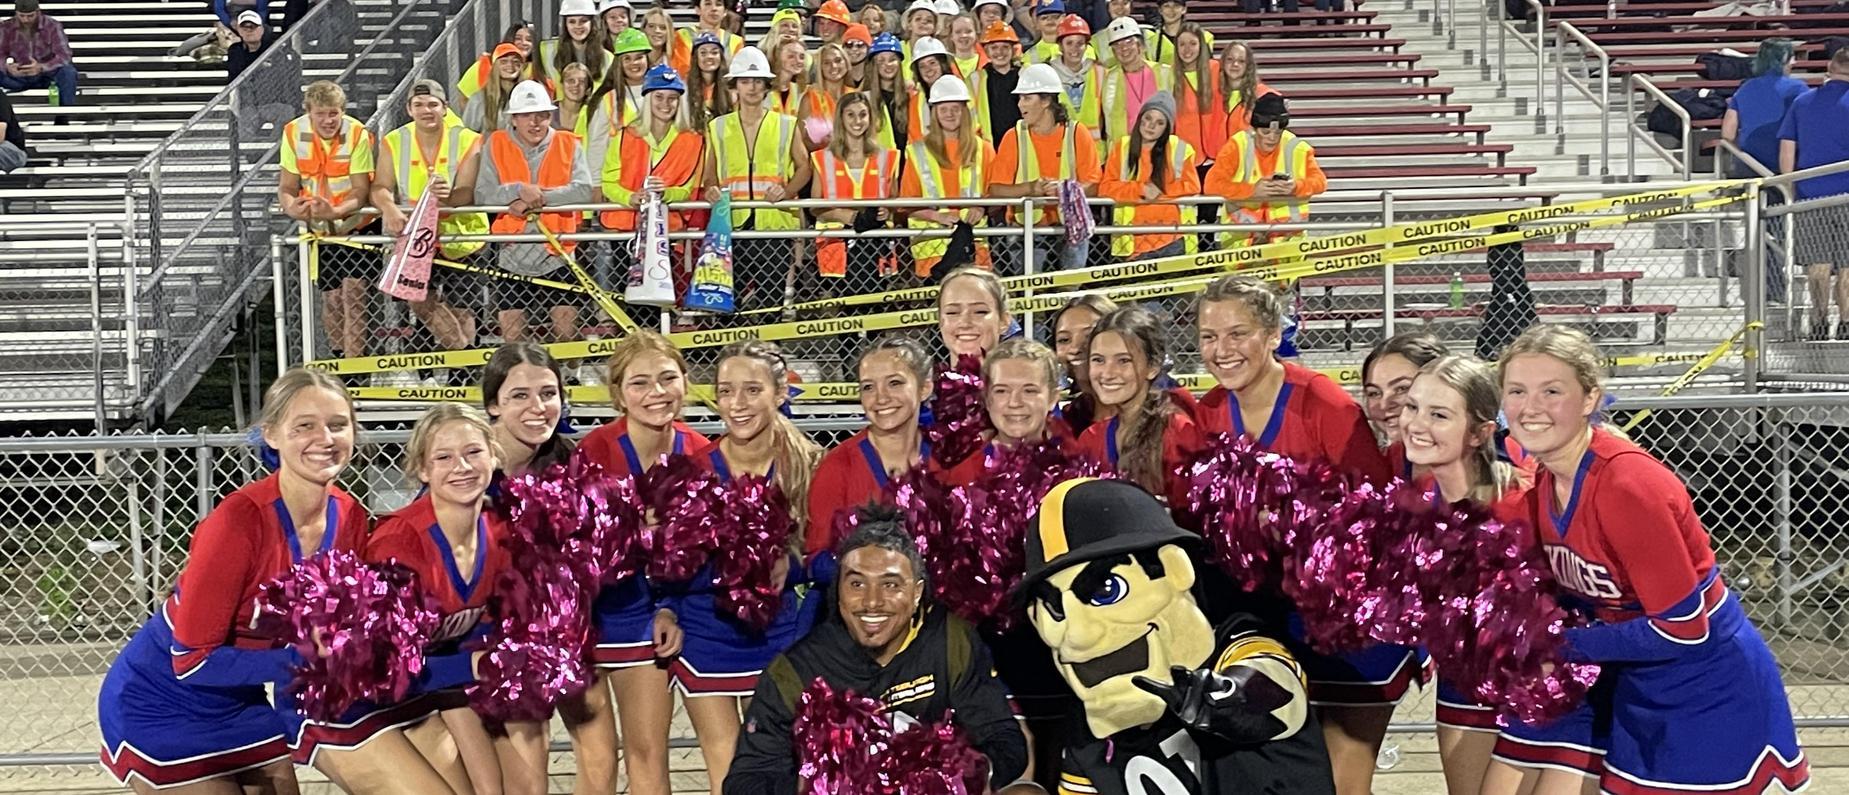 Cheer & Students